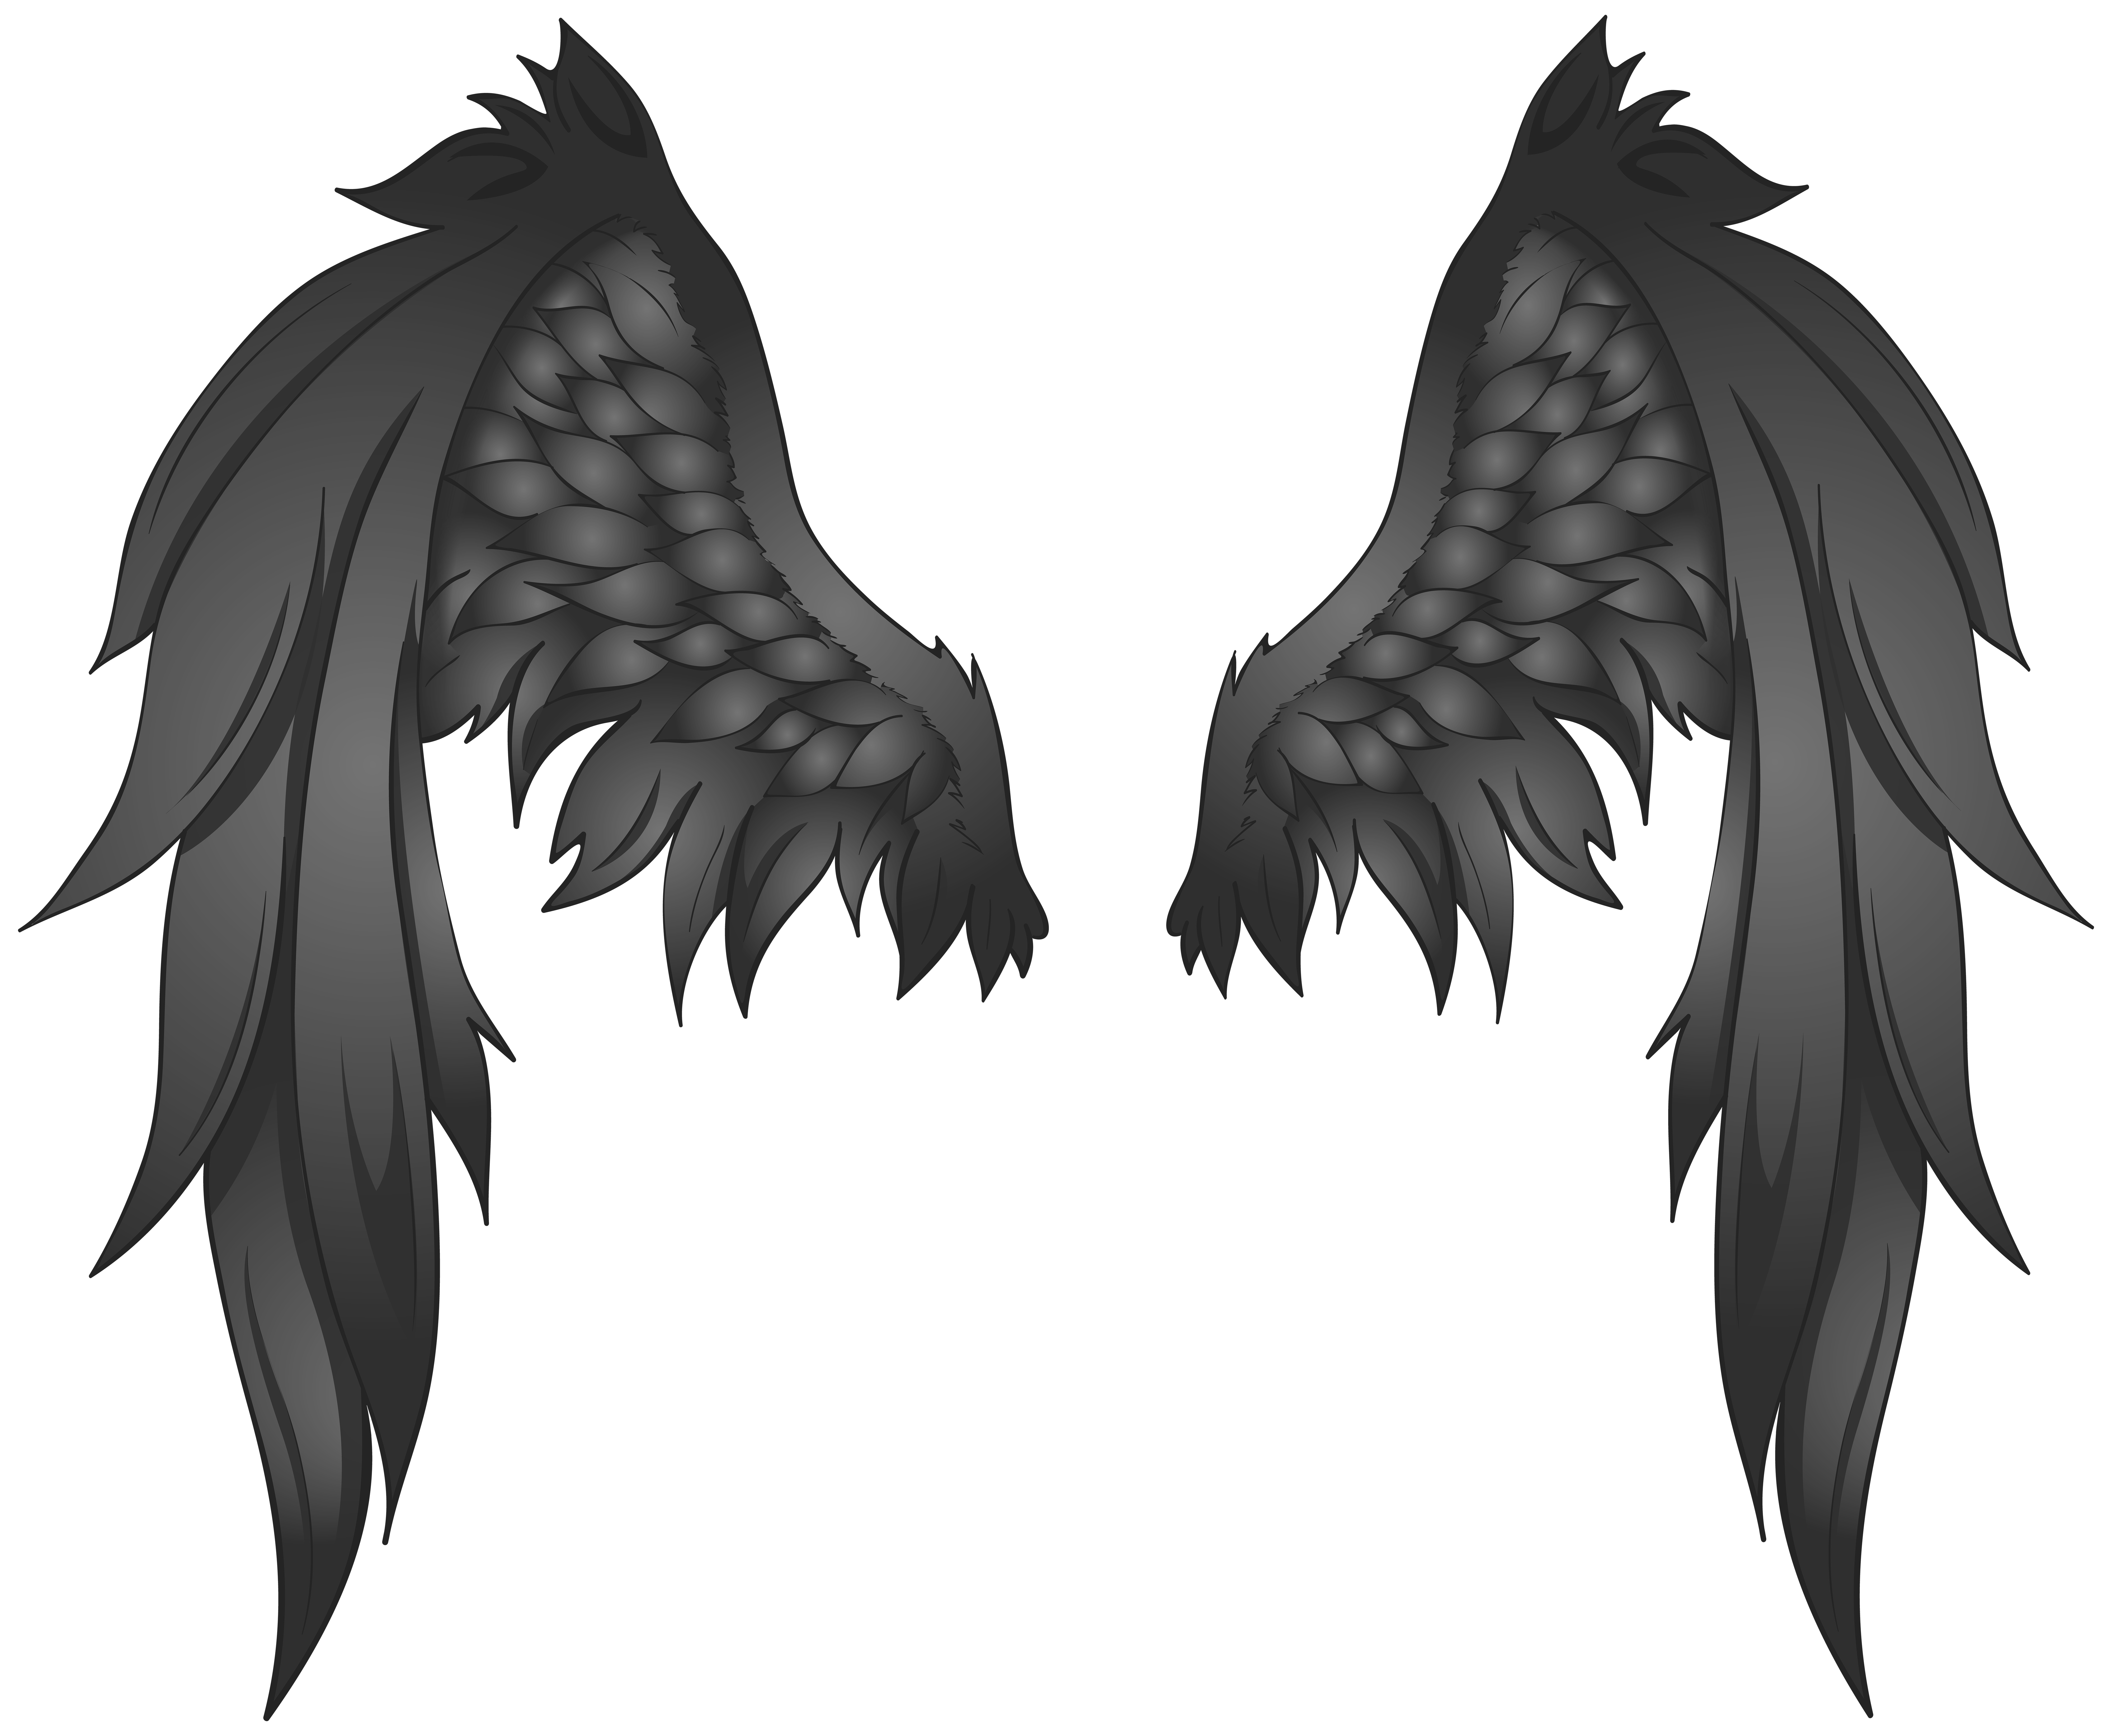 Black wings transparent png. Wing clipart supernatural